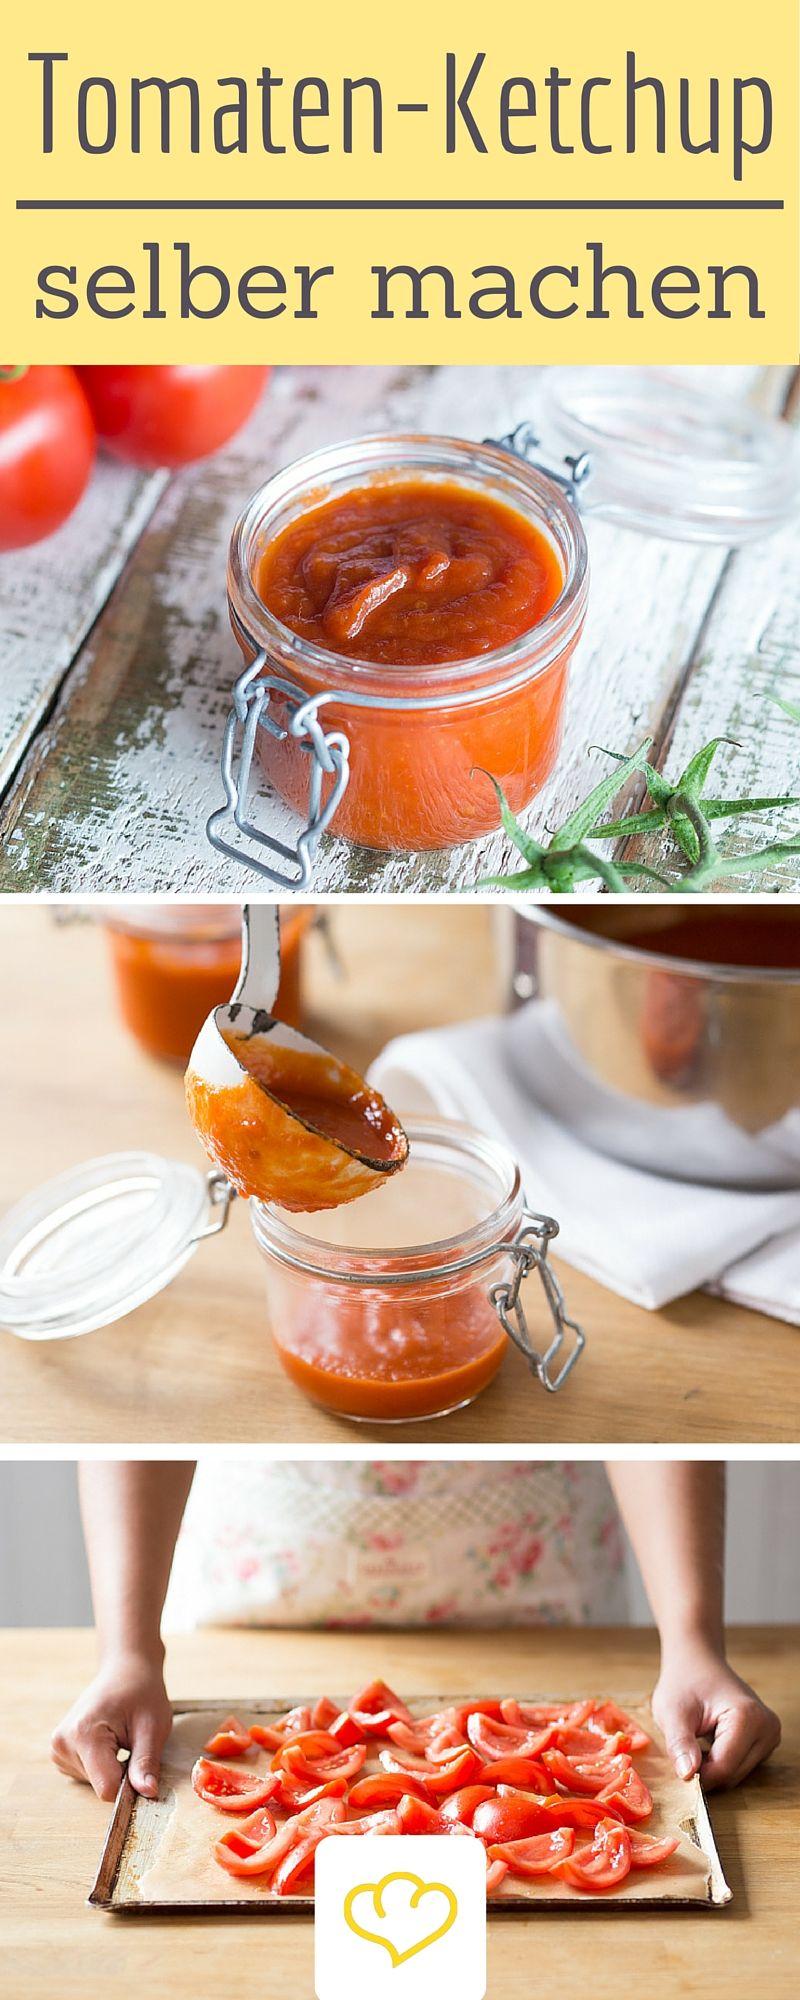 ketchup selber machen so funktioniert s rezept leckere rezepte tasty recipies. Black Bedroom Furniture Sets. Home Design Ideas